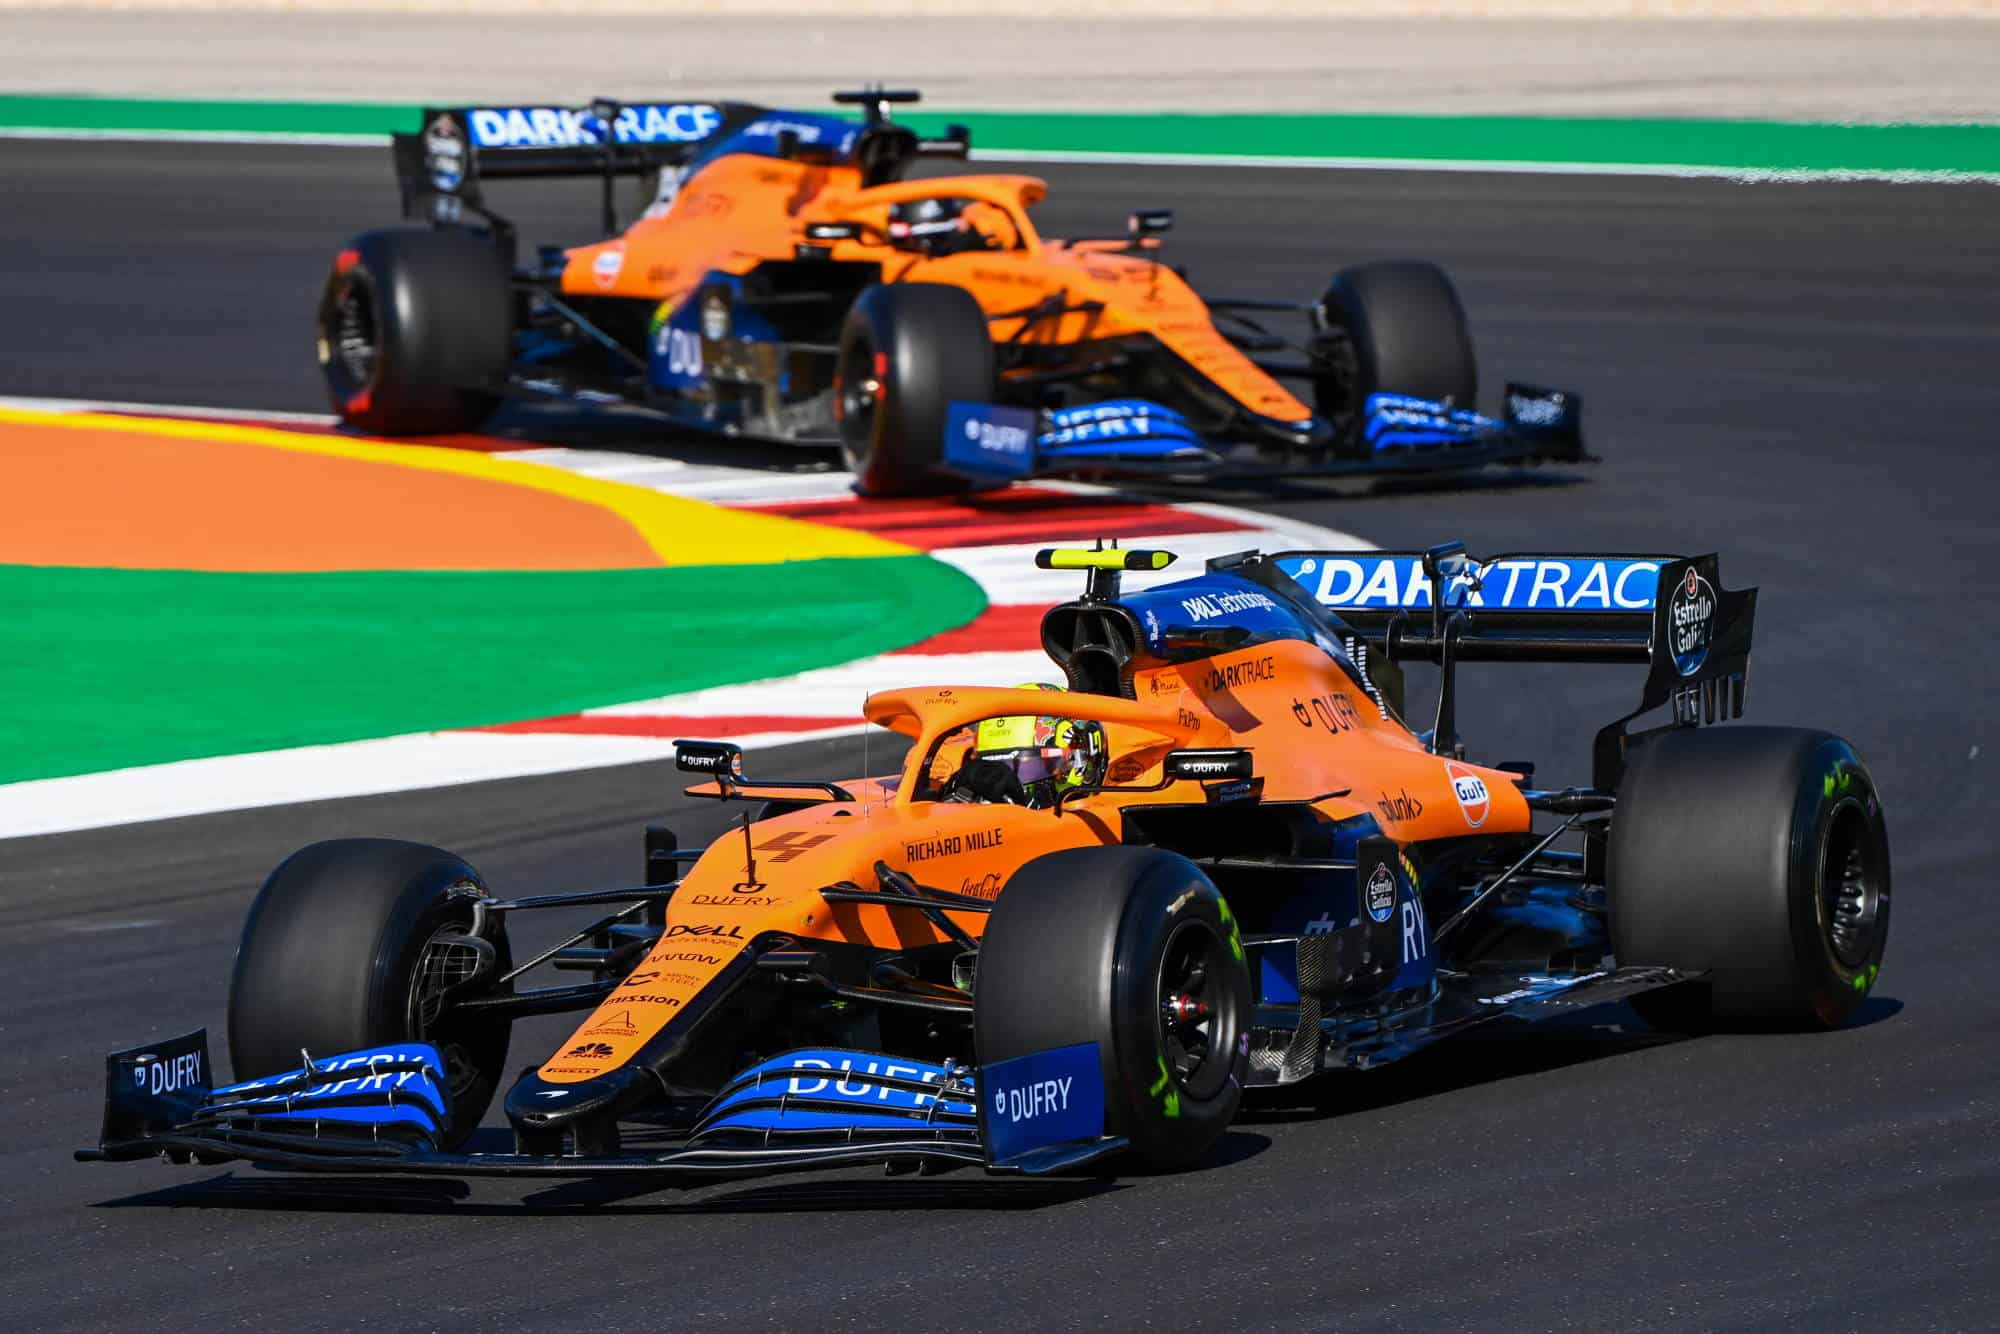 Lando Norris, McLaren MCL35 leads Carlos Sainz, McLaren MCL35